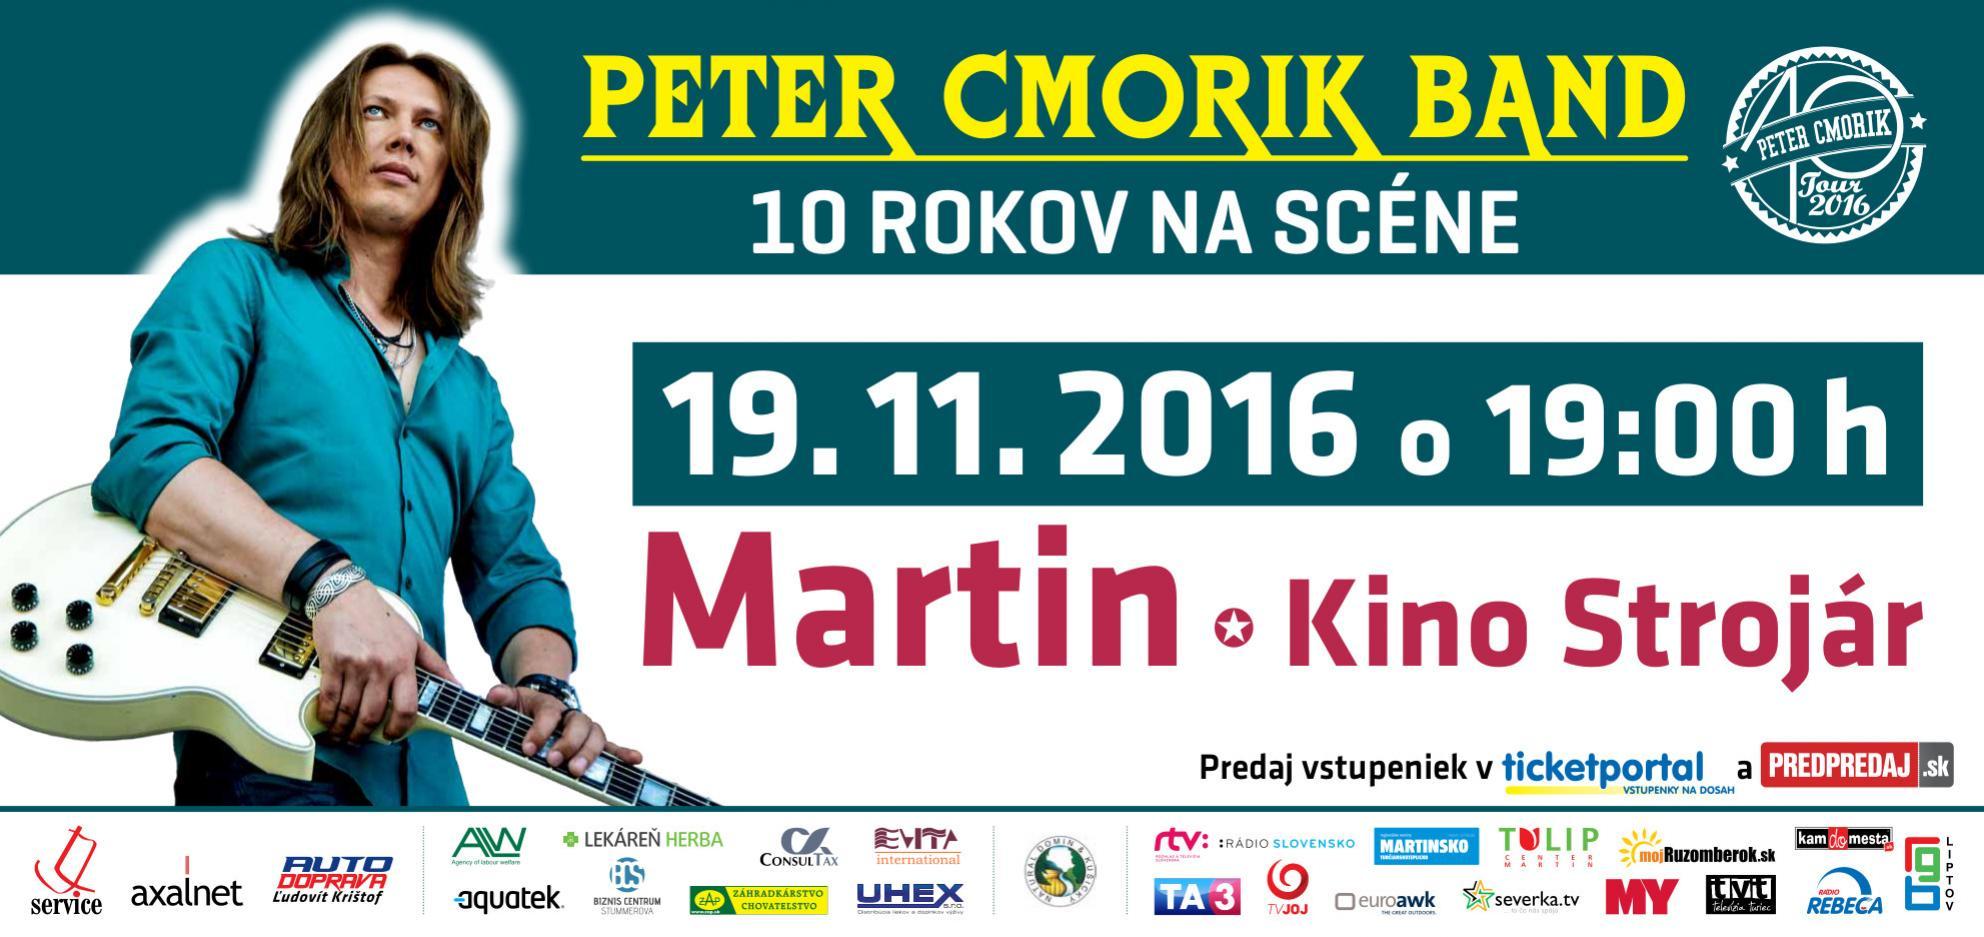 Peter Cmorik Band 10 rokov na scéne 6ebfa87b099